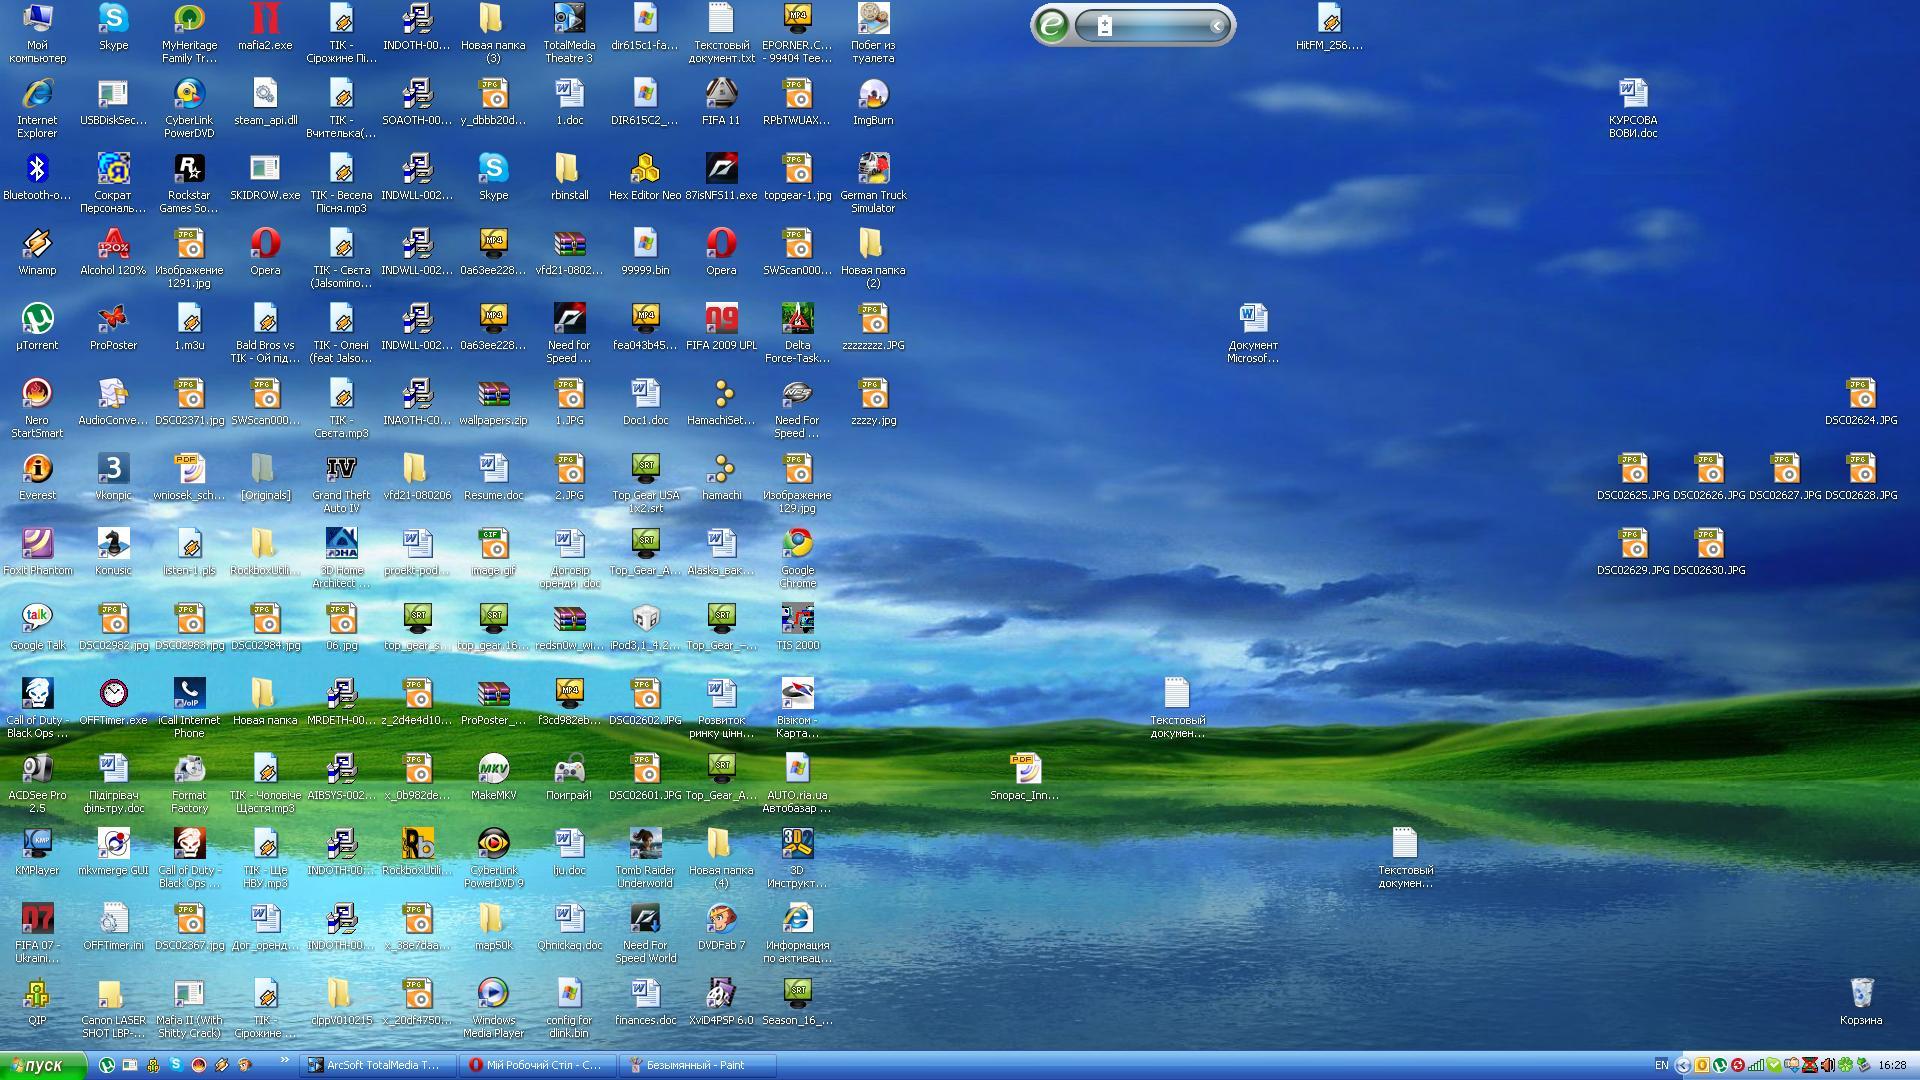 Фото на рабочий стол с windows zveri 3